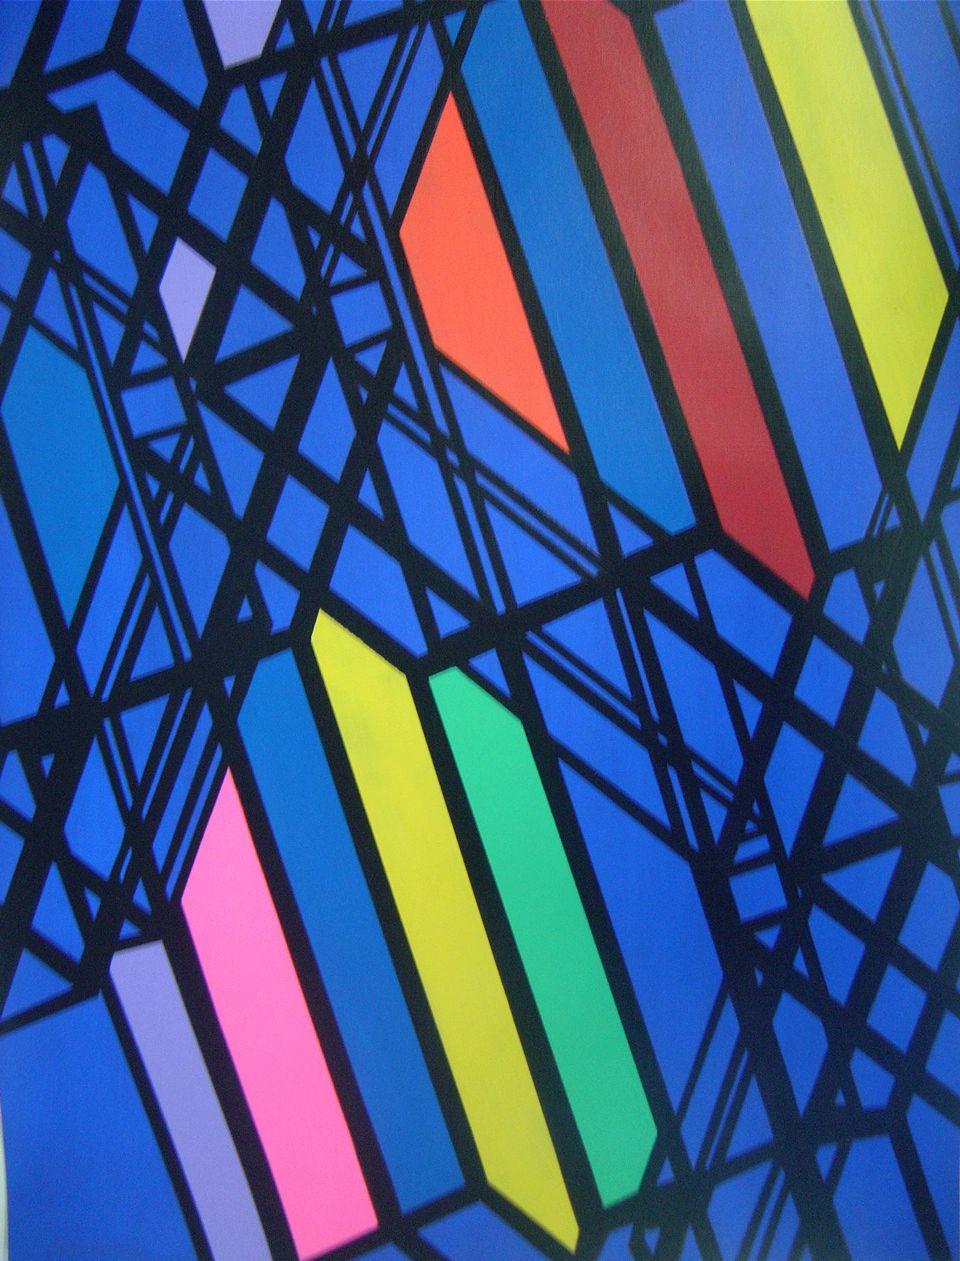 Billund. Acrylic on paper. 70x50 cm. 2013